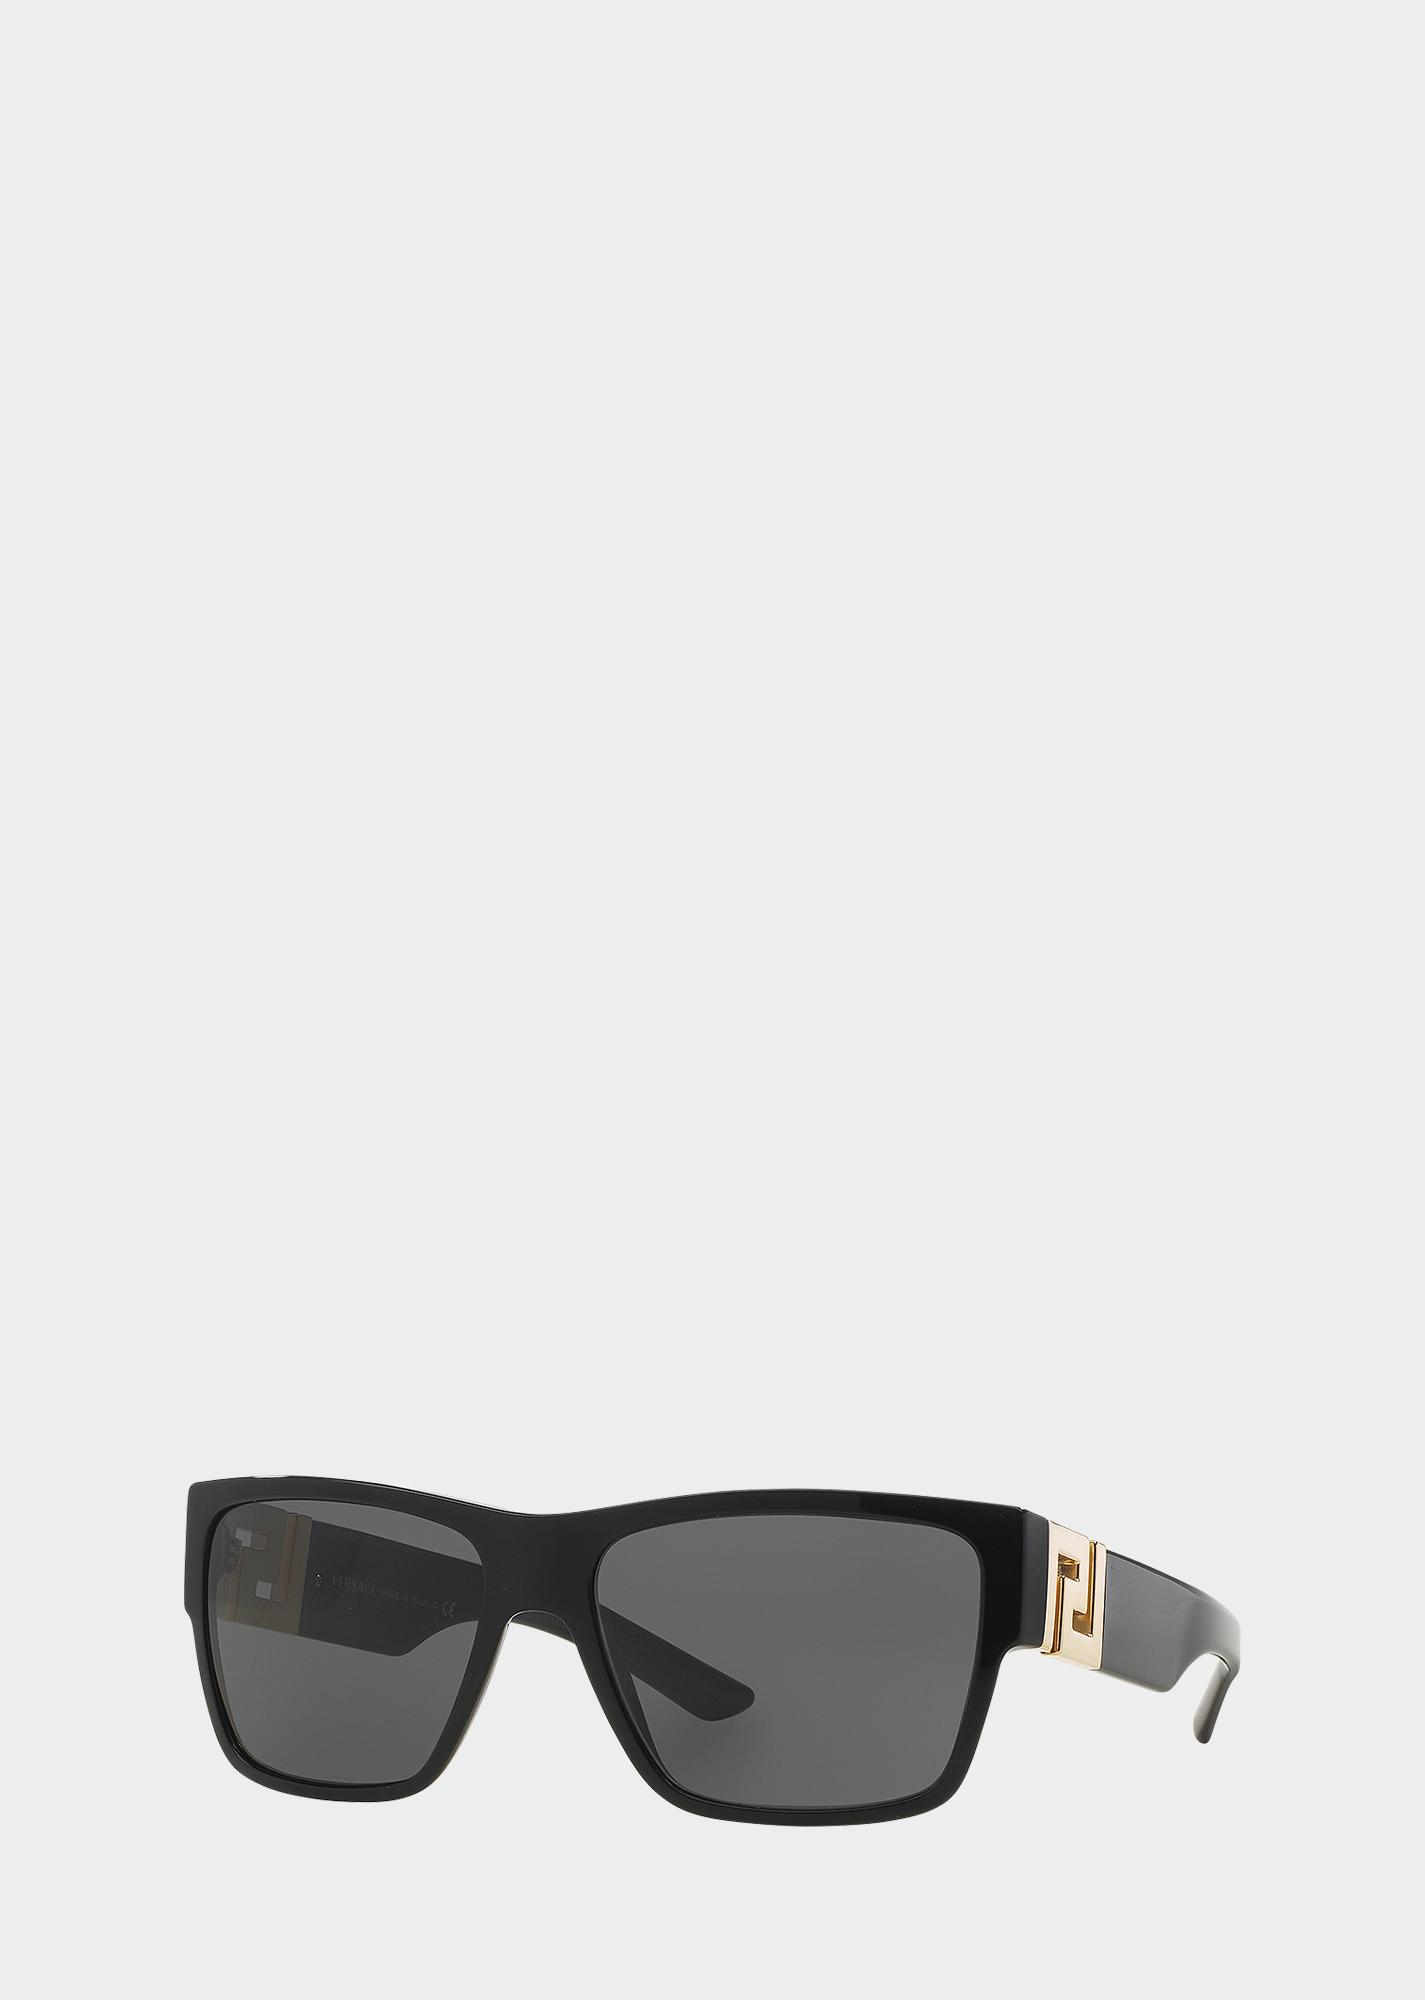 f60803da09c Black Greca Squared Sunglasses for Men